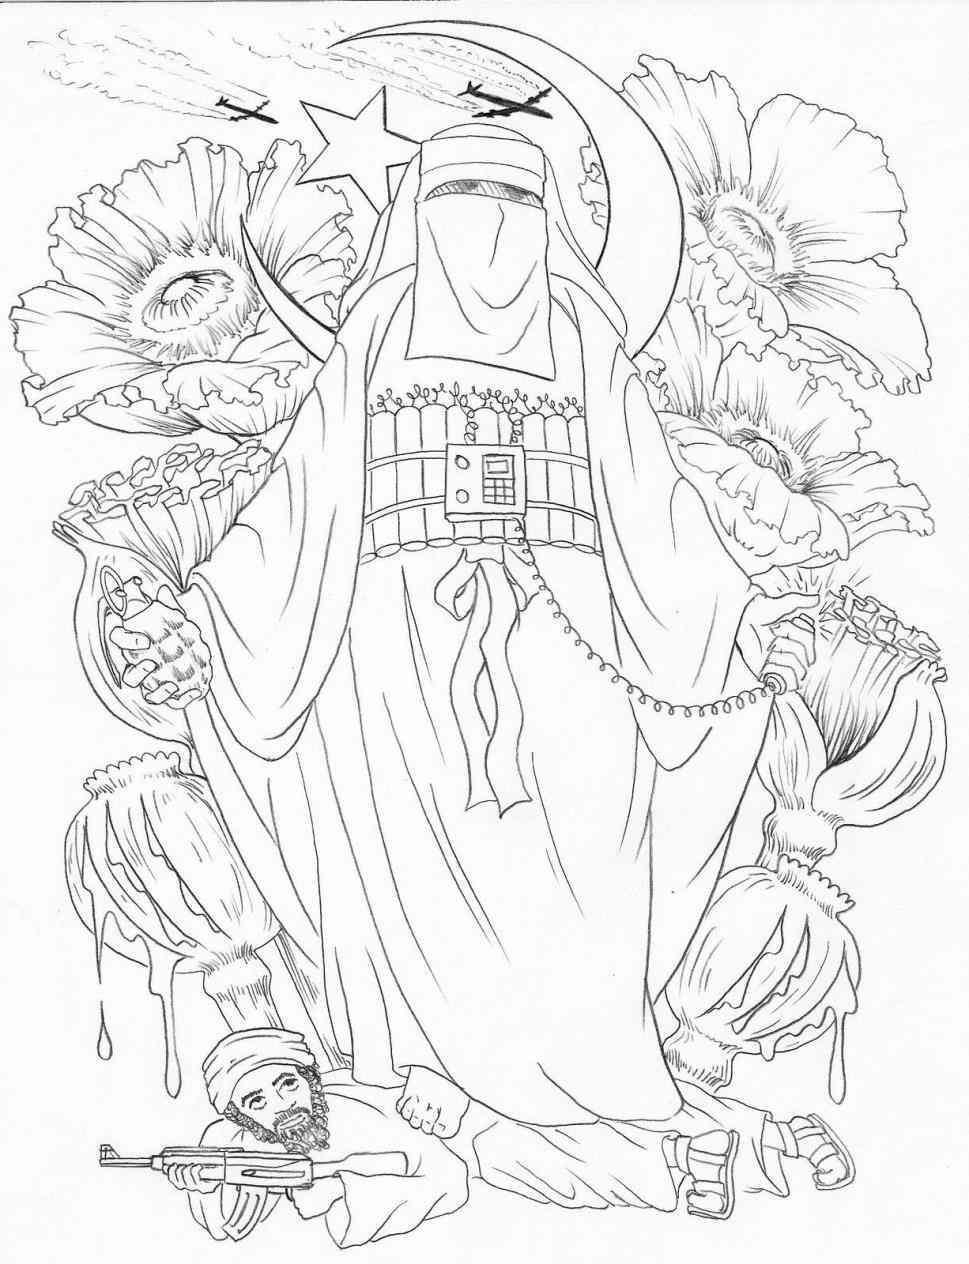 Half Angel Half Demon Drawing at GetDrawings com   Free for personal